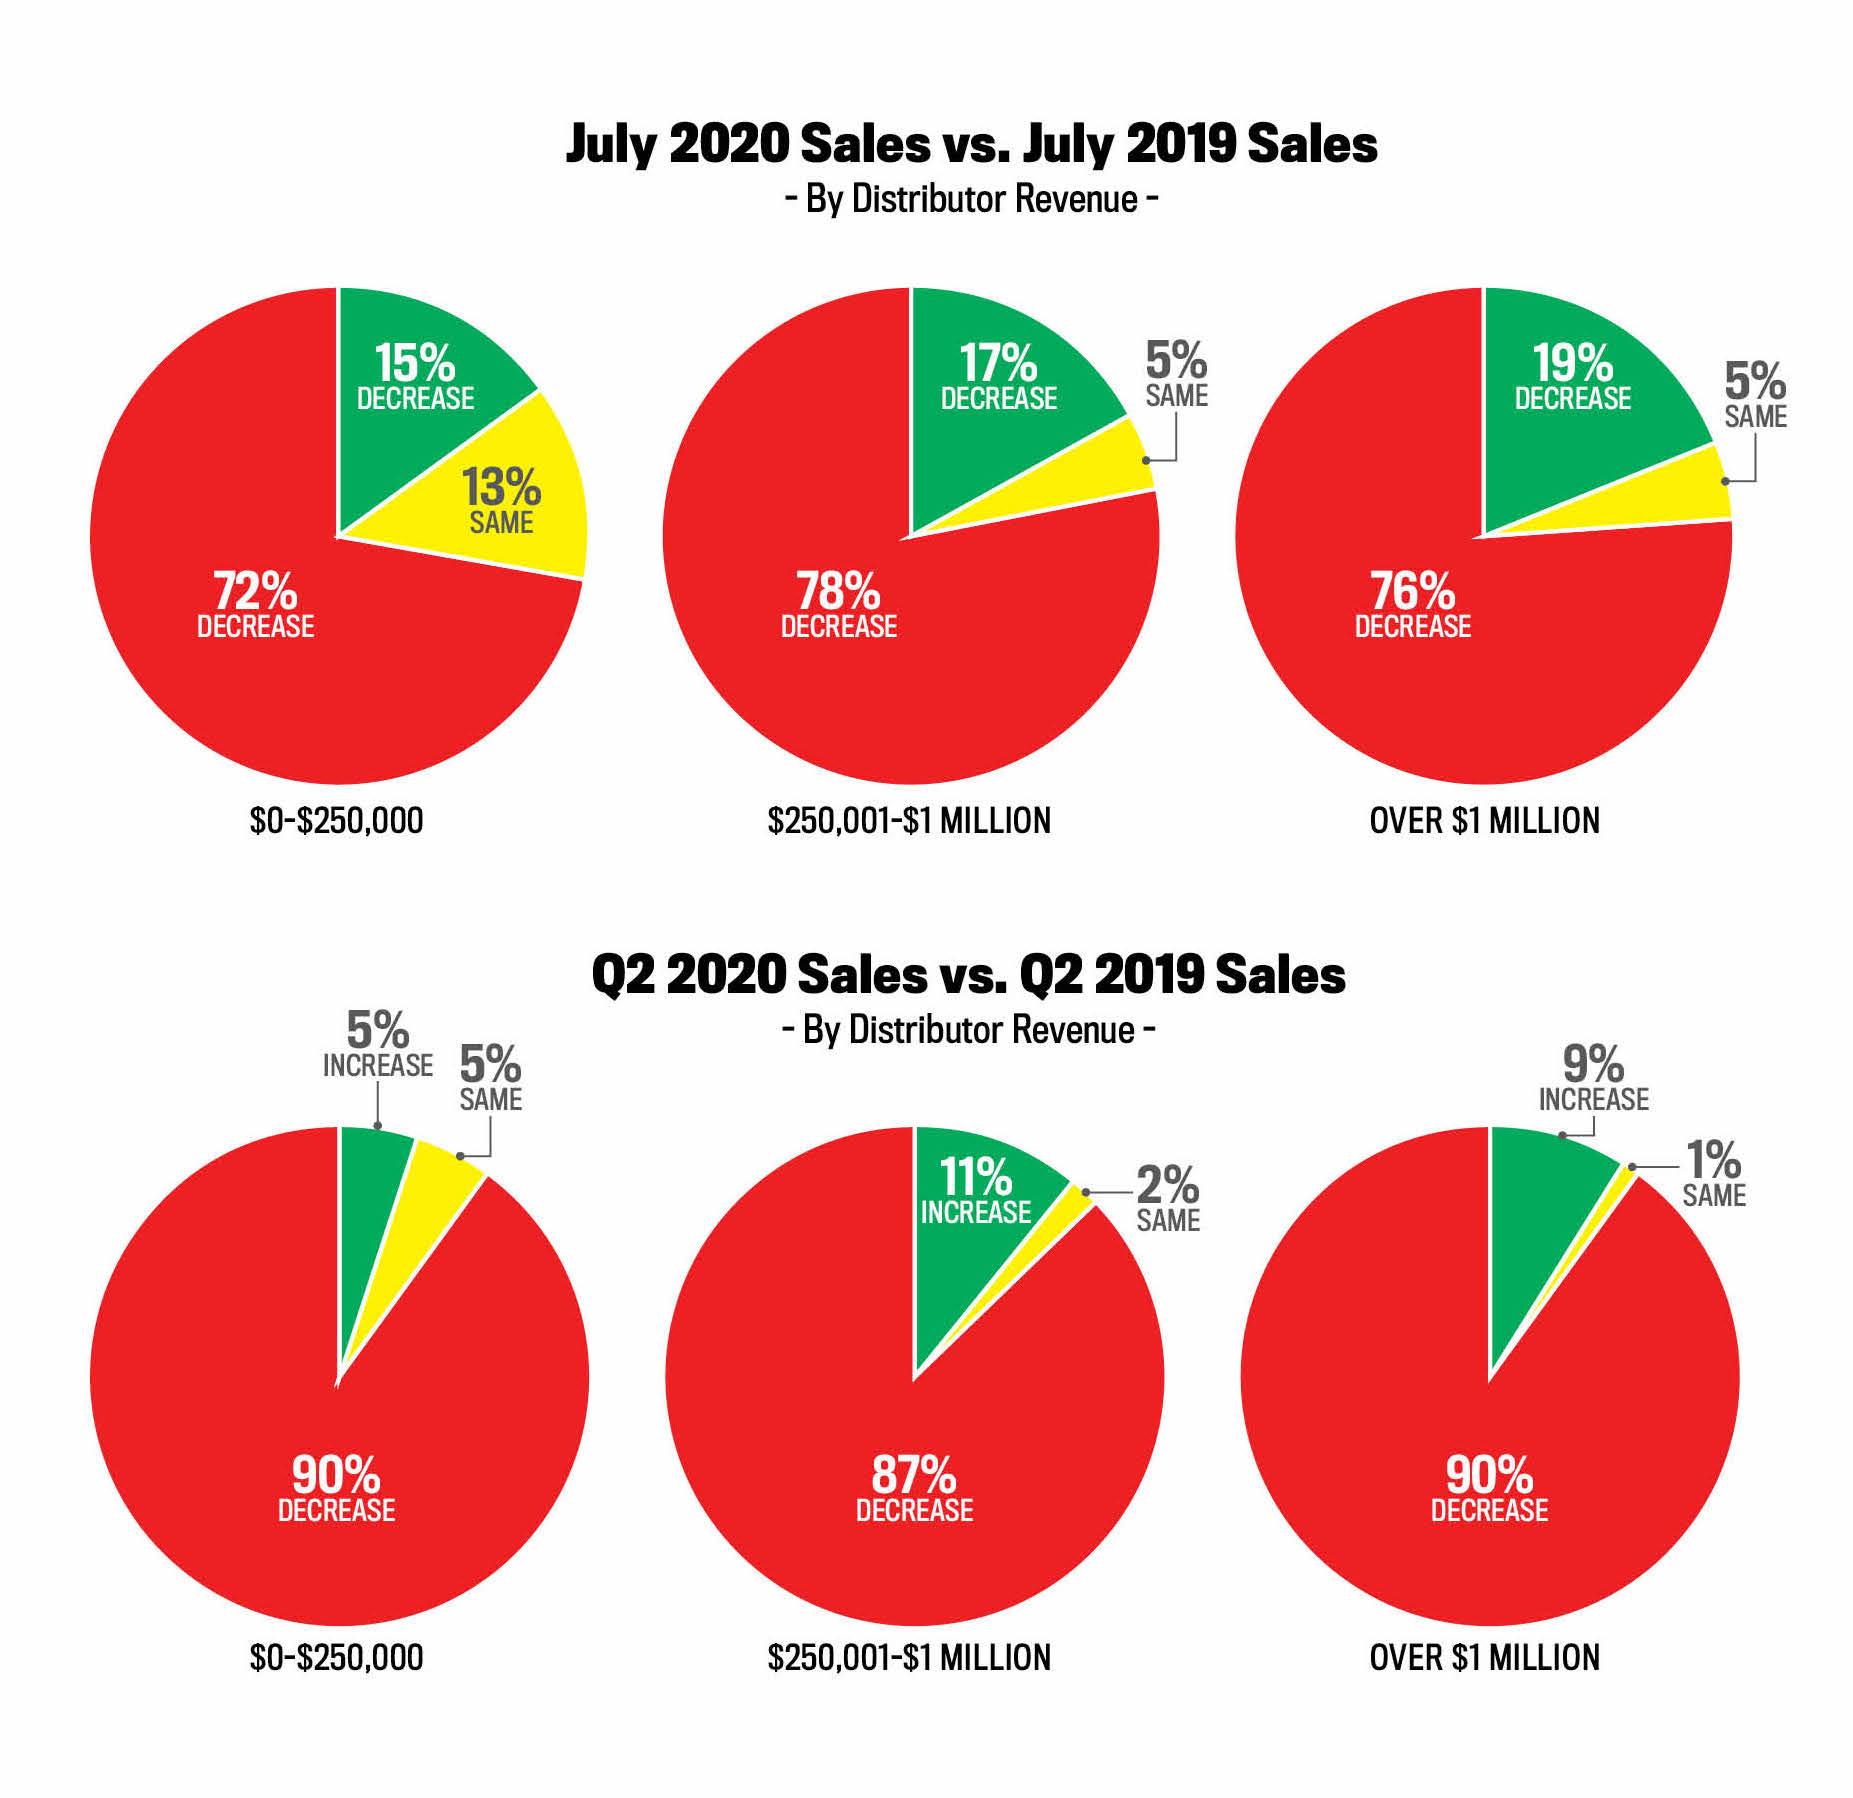 Promo Distributor Sales Improve In July